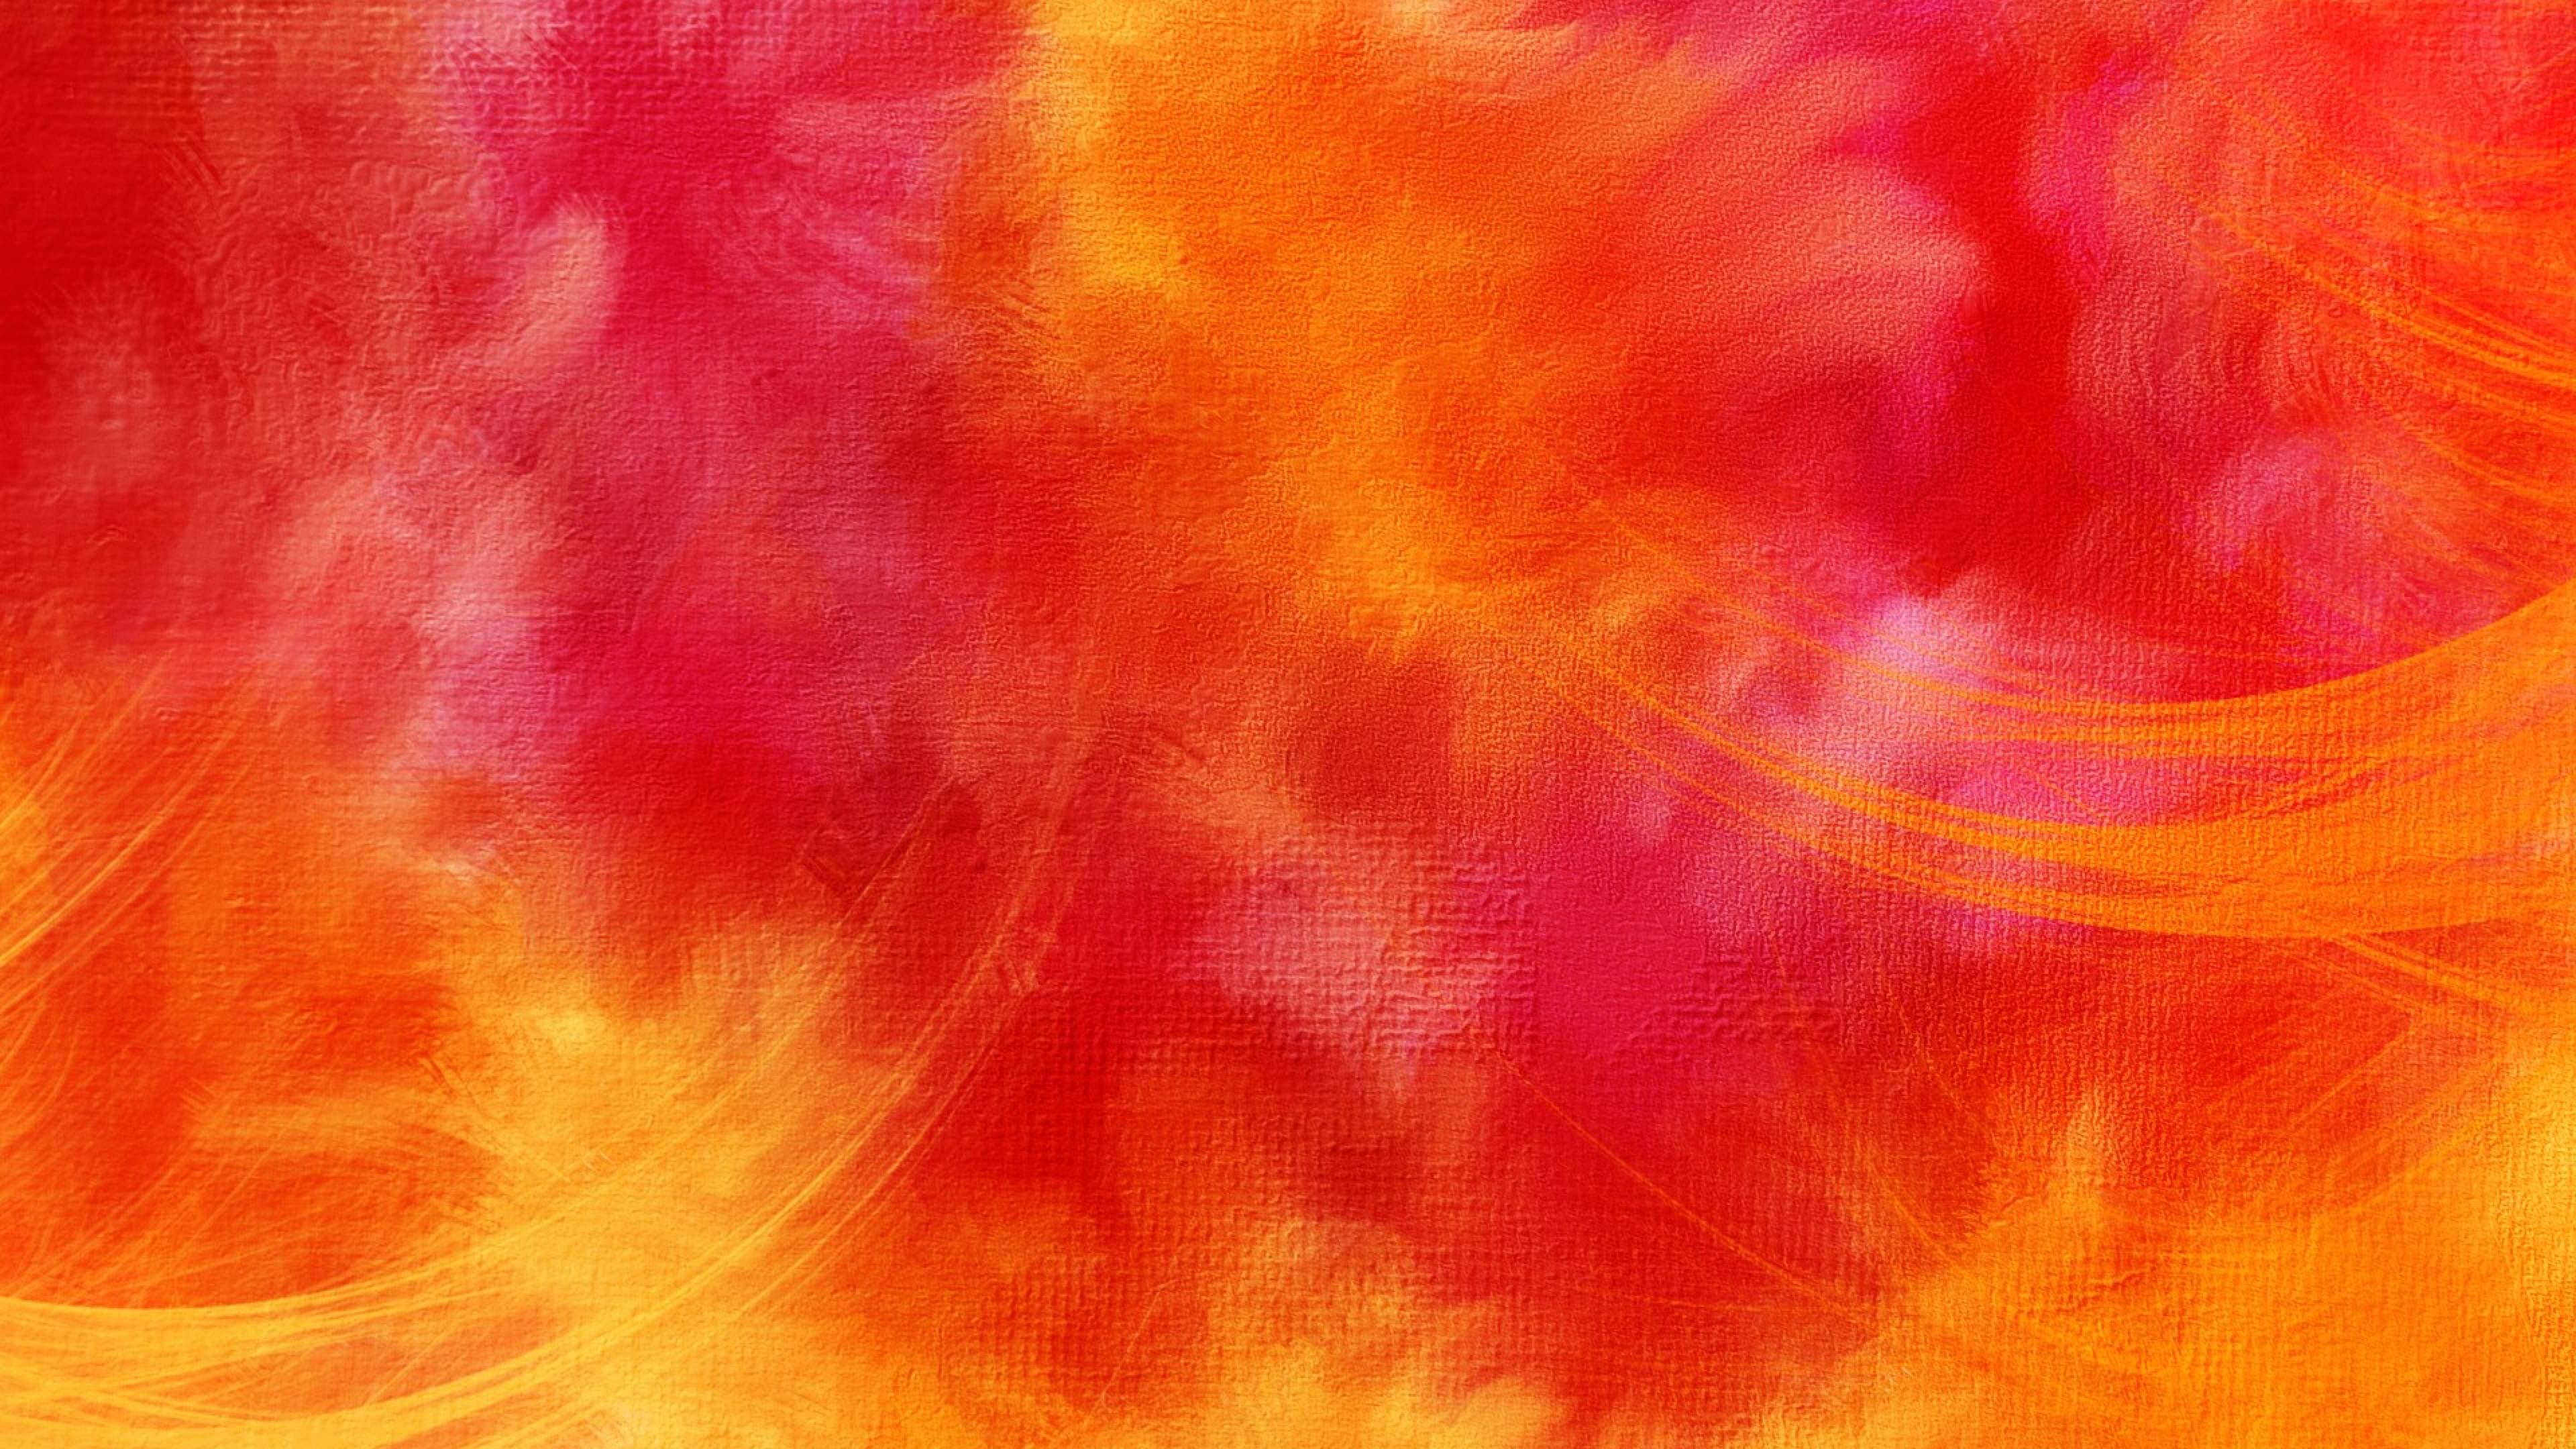 Wallpaper Orange Galaxy Tumblr